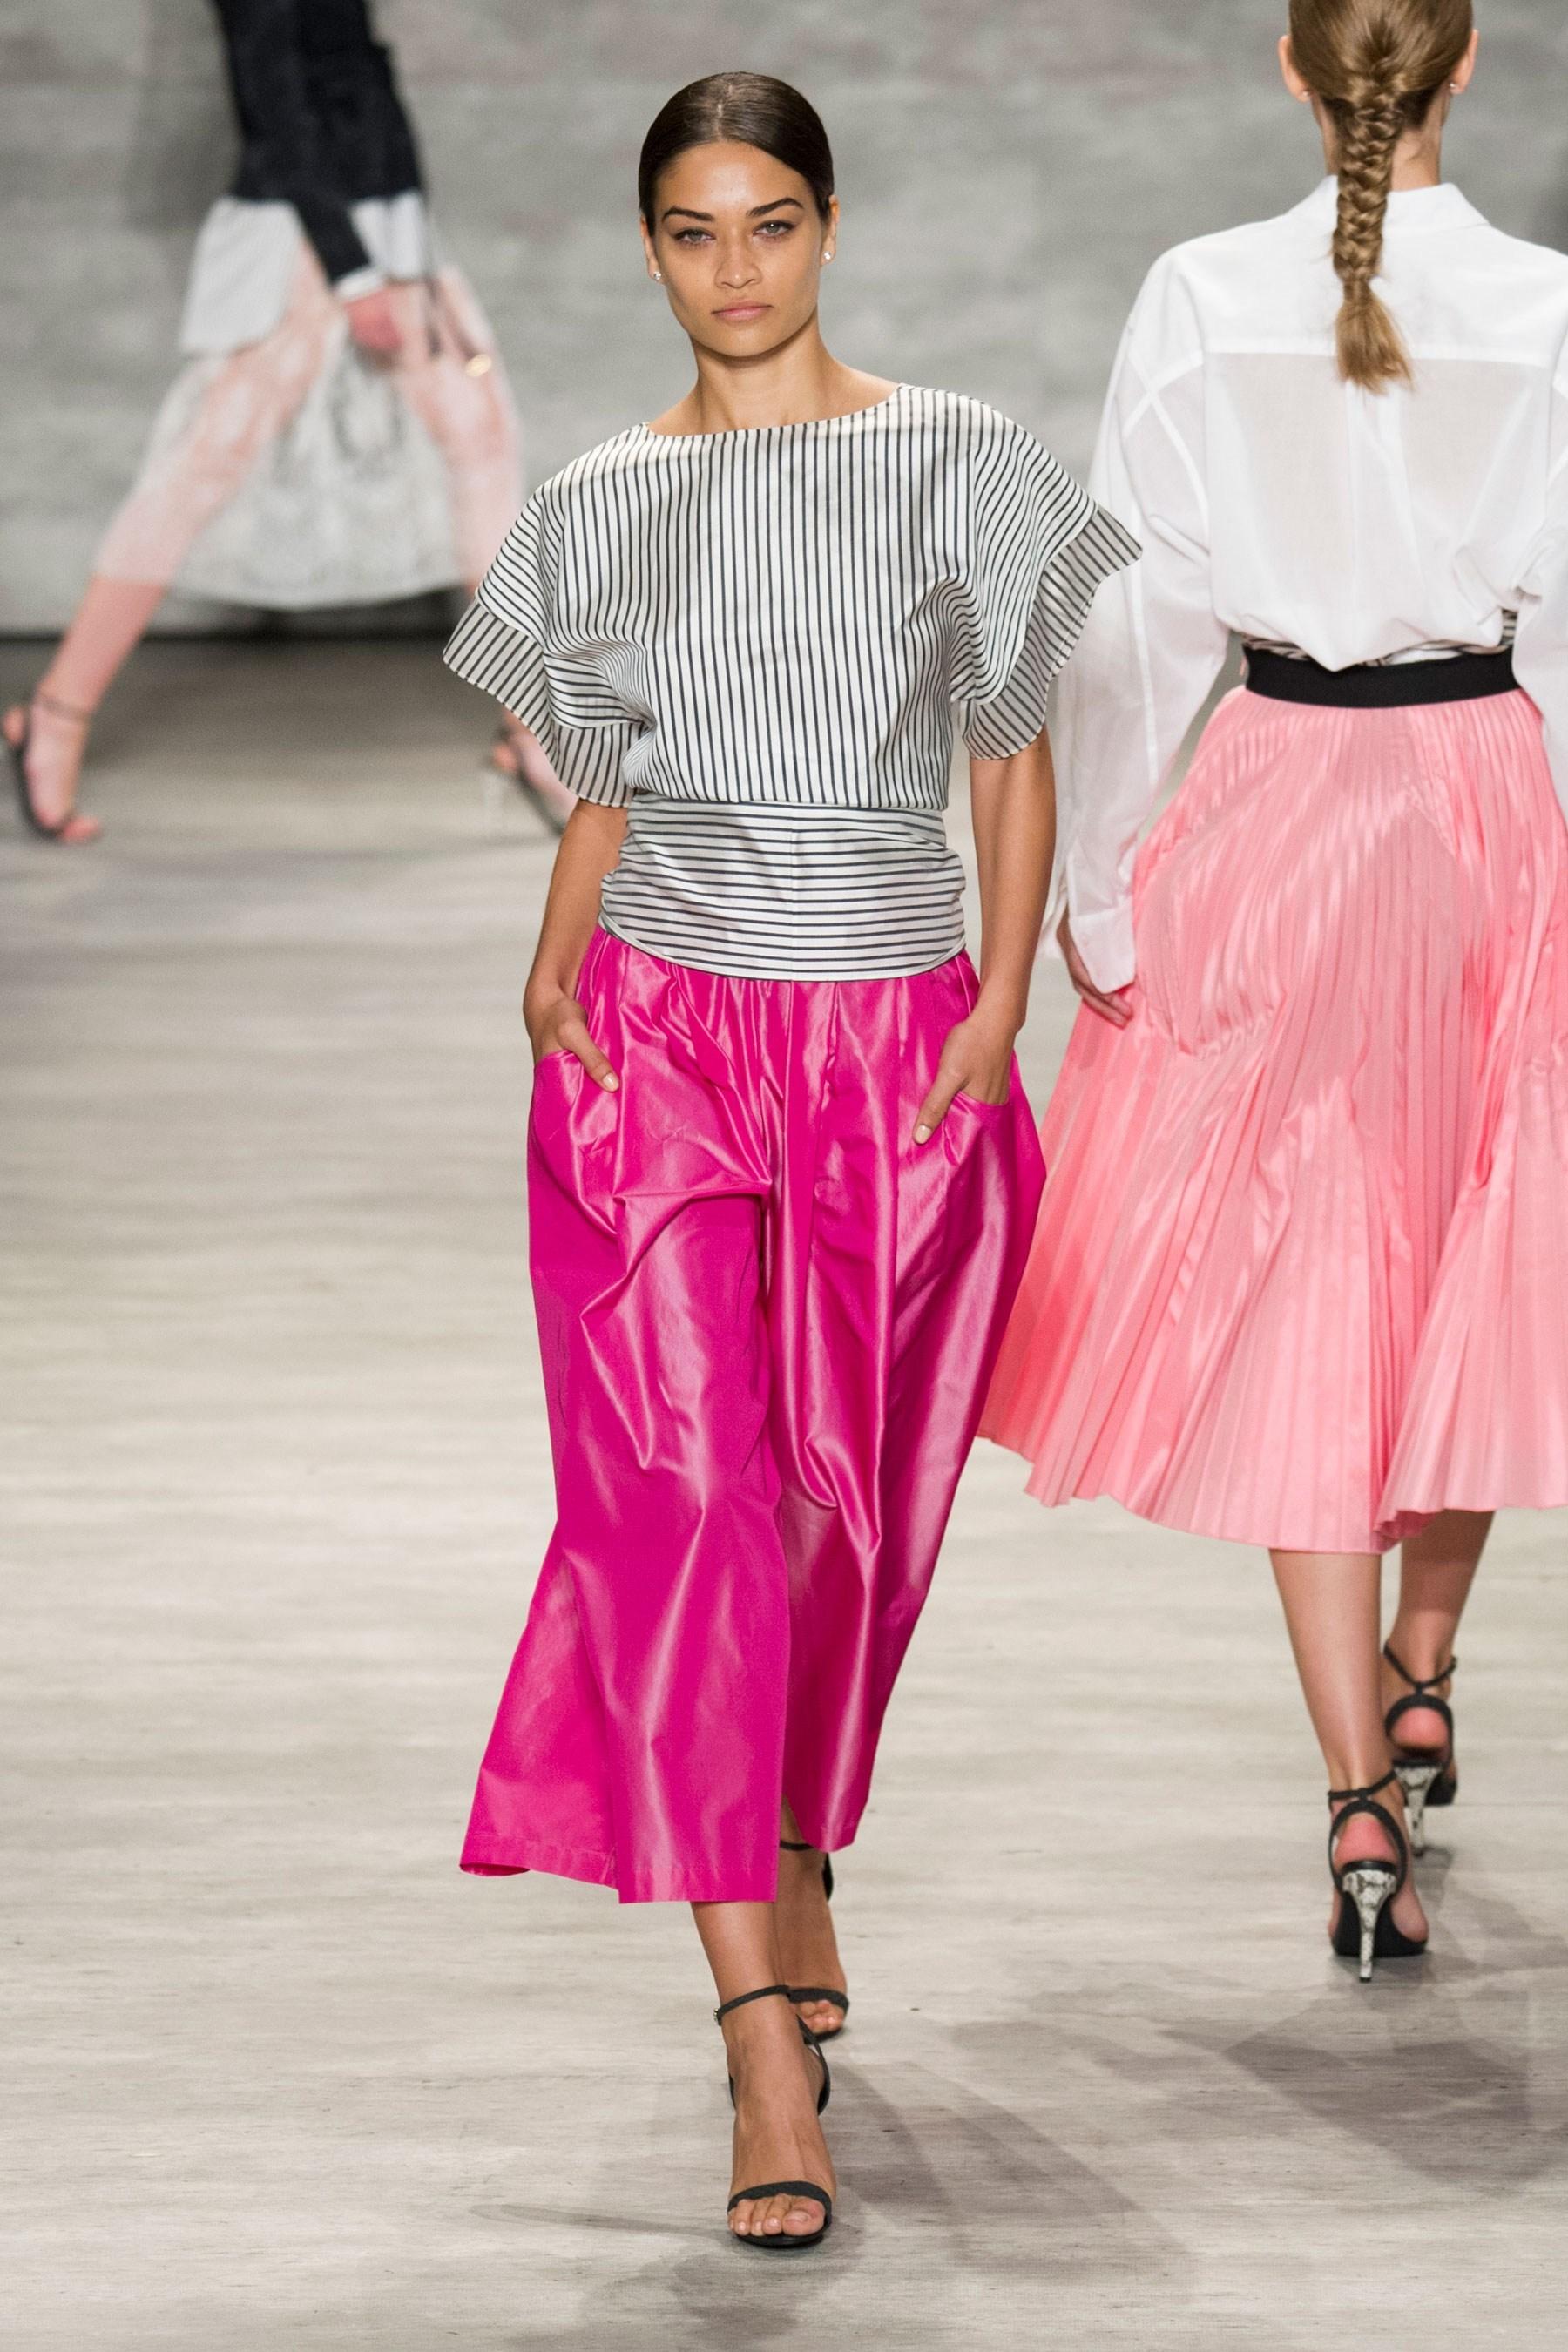 Shanina Shaik in Tome SS15 runway show at New York Fashion Week